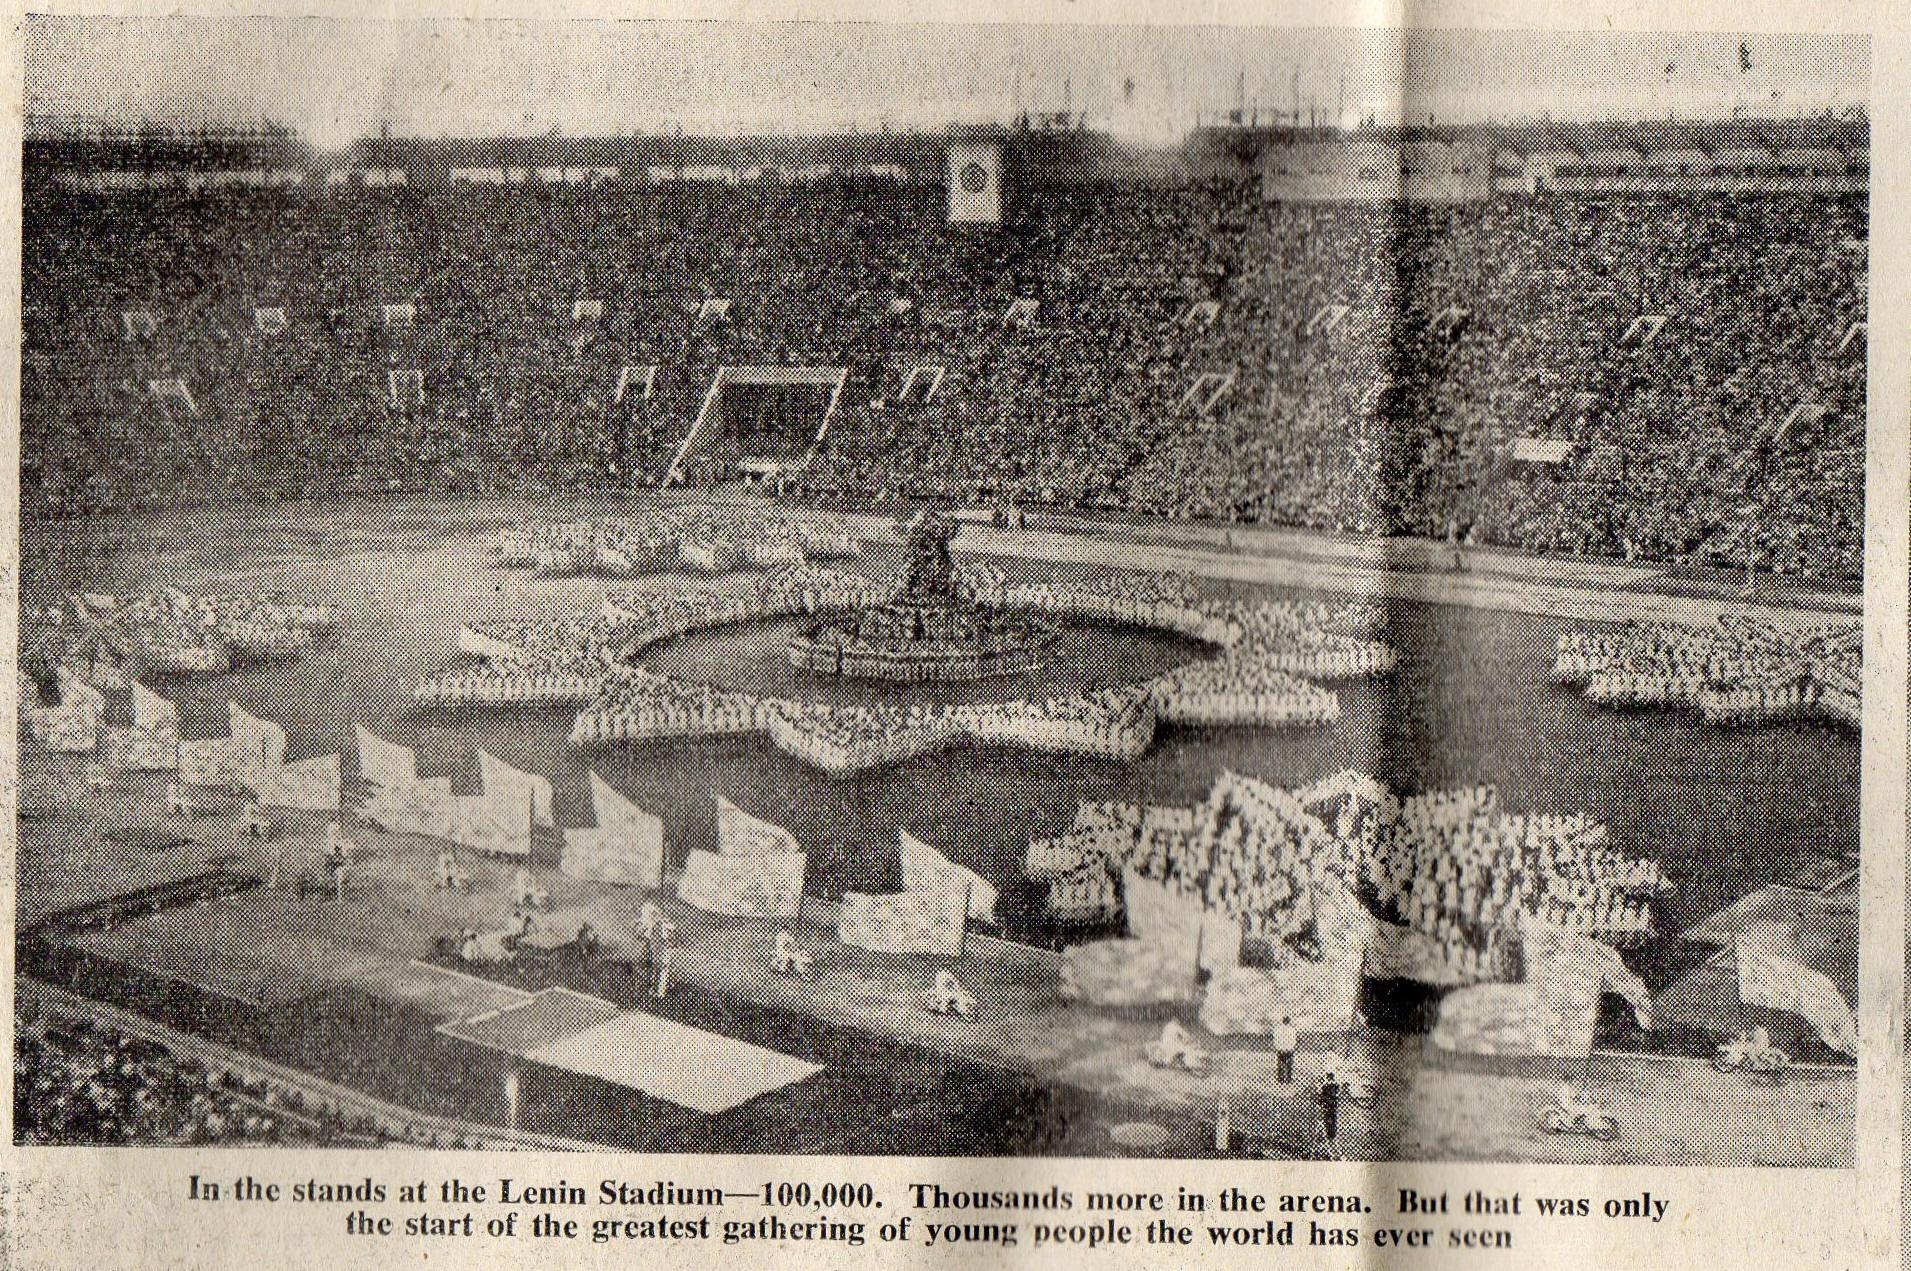 The opening ceremony in the Lenin Stadium